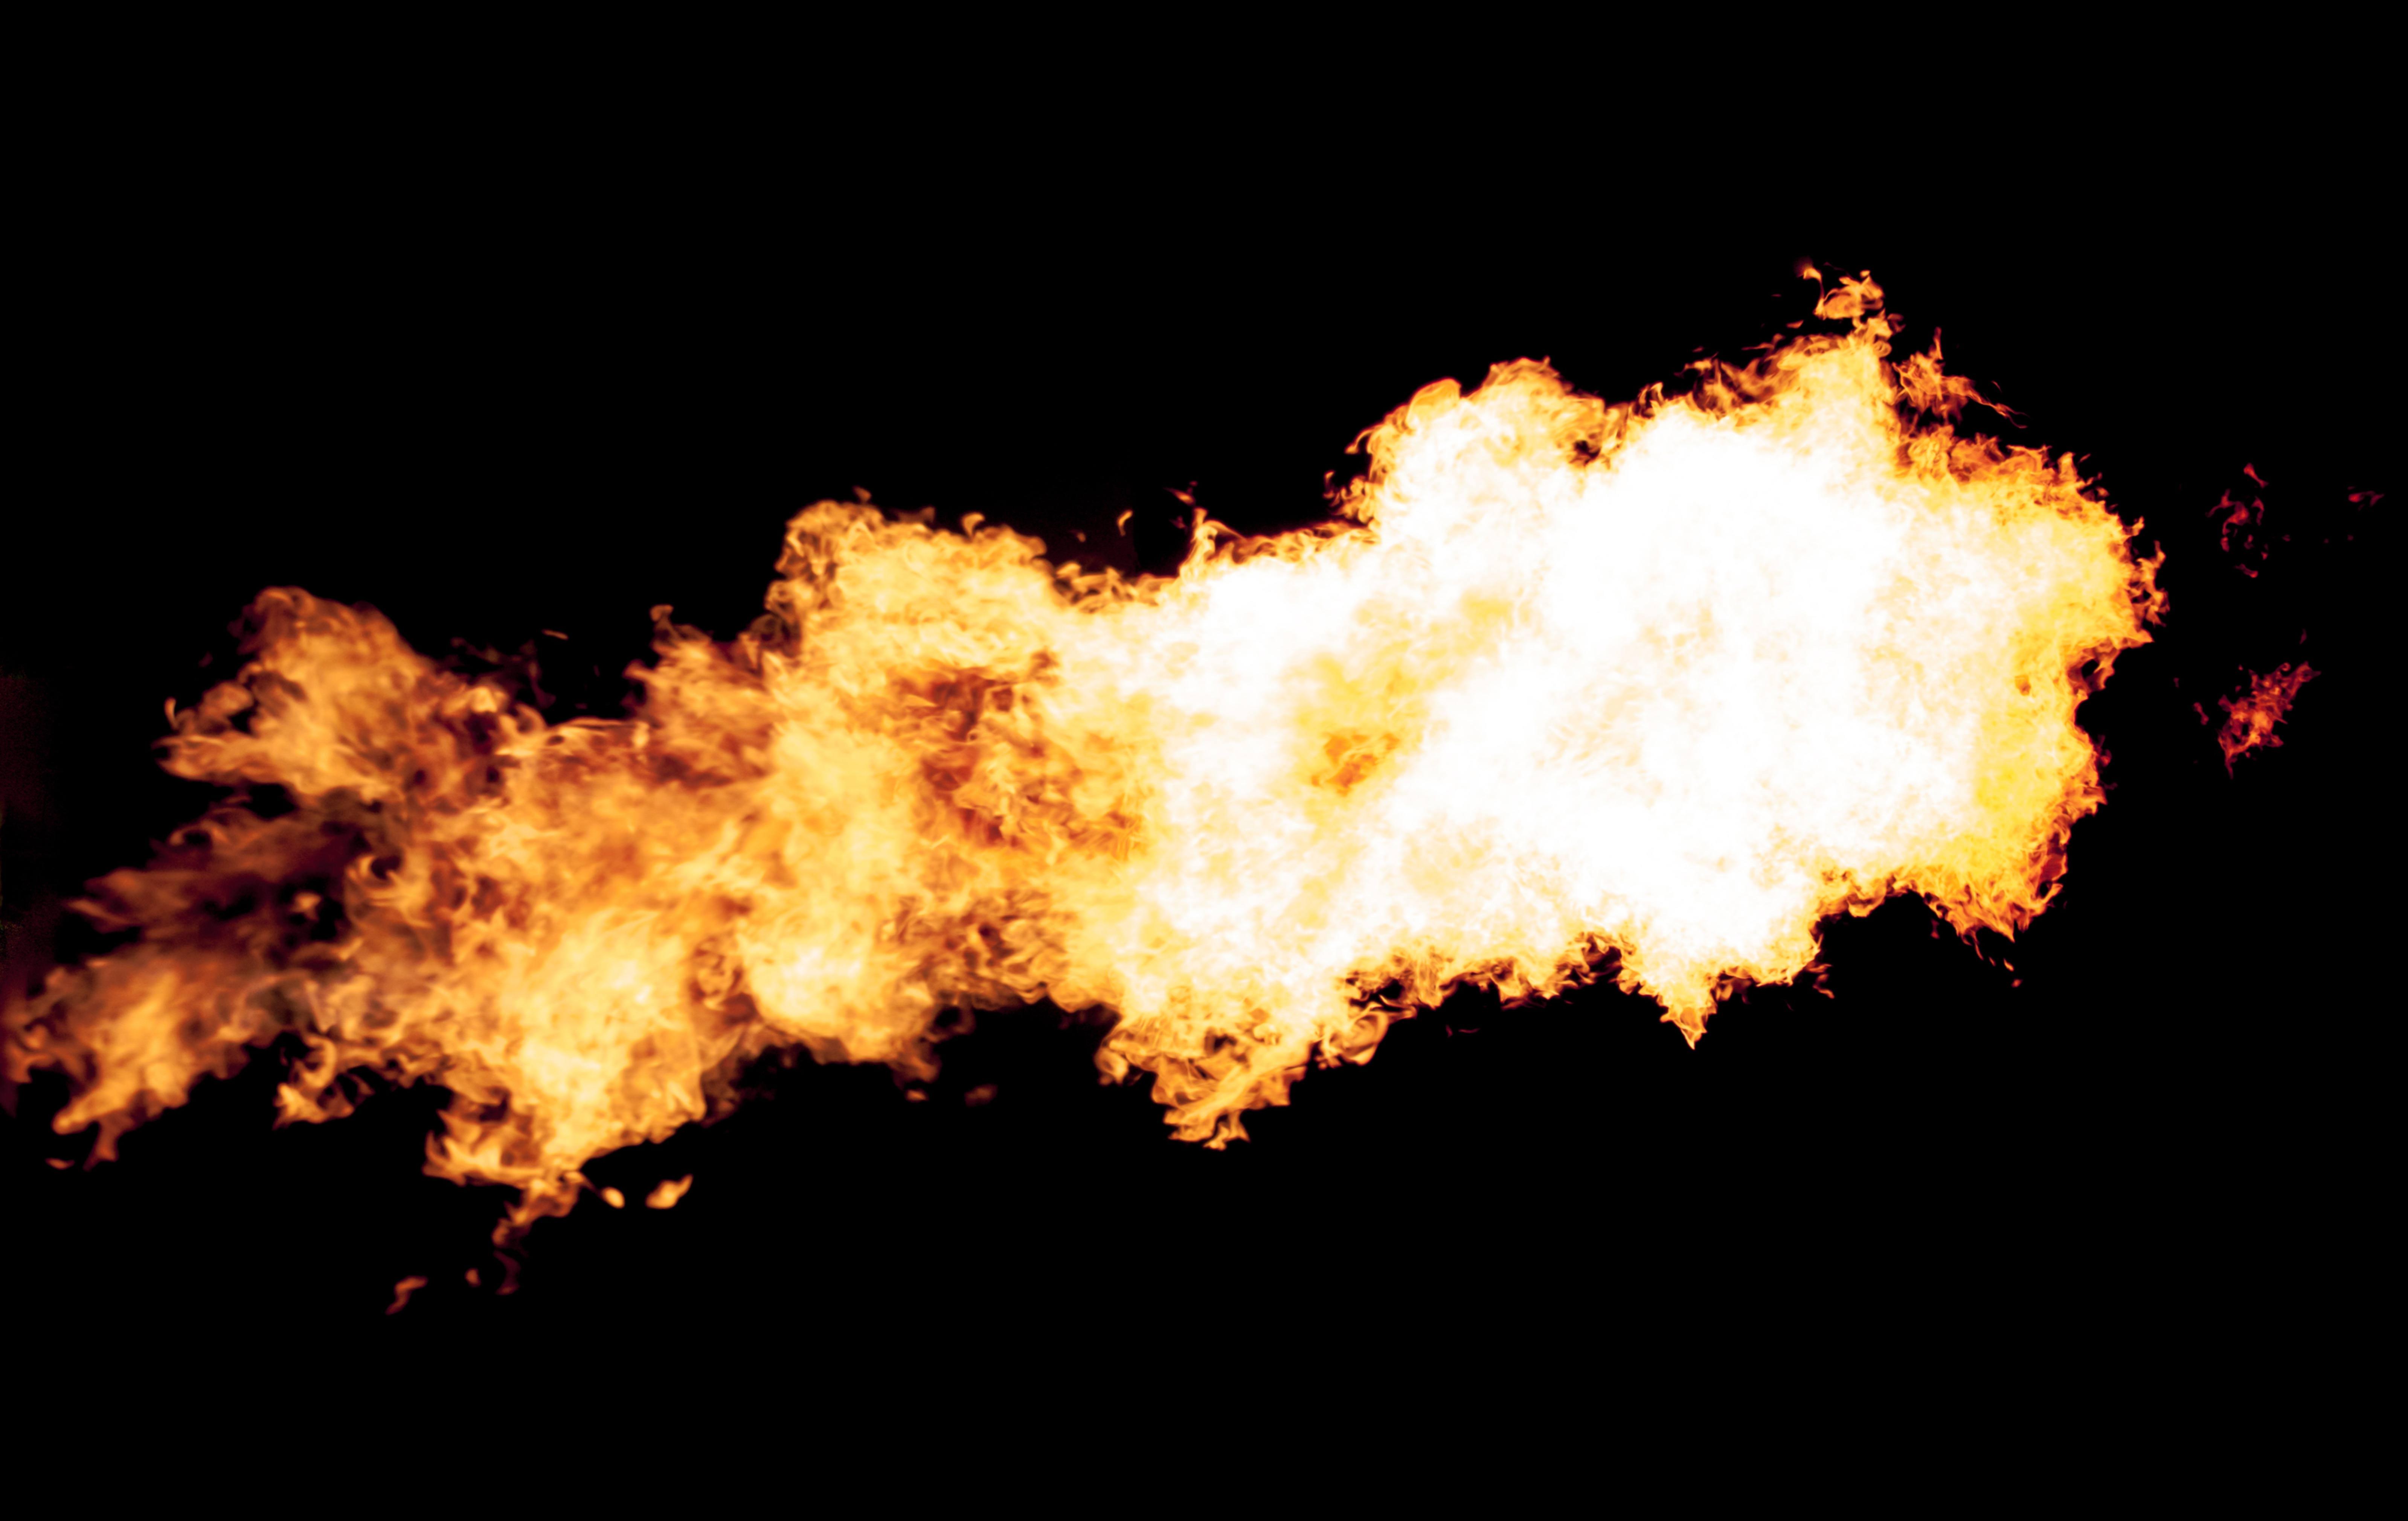 Fire burst on black background